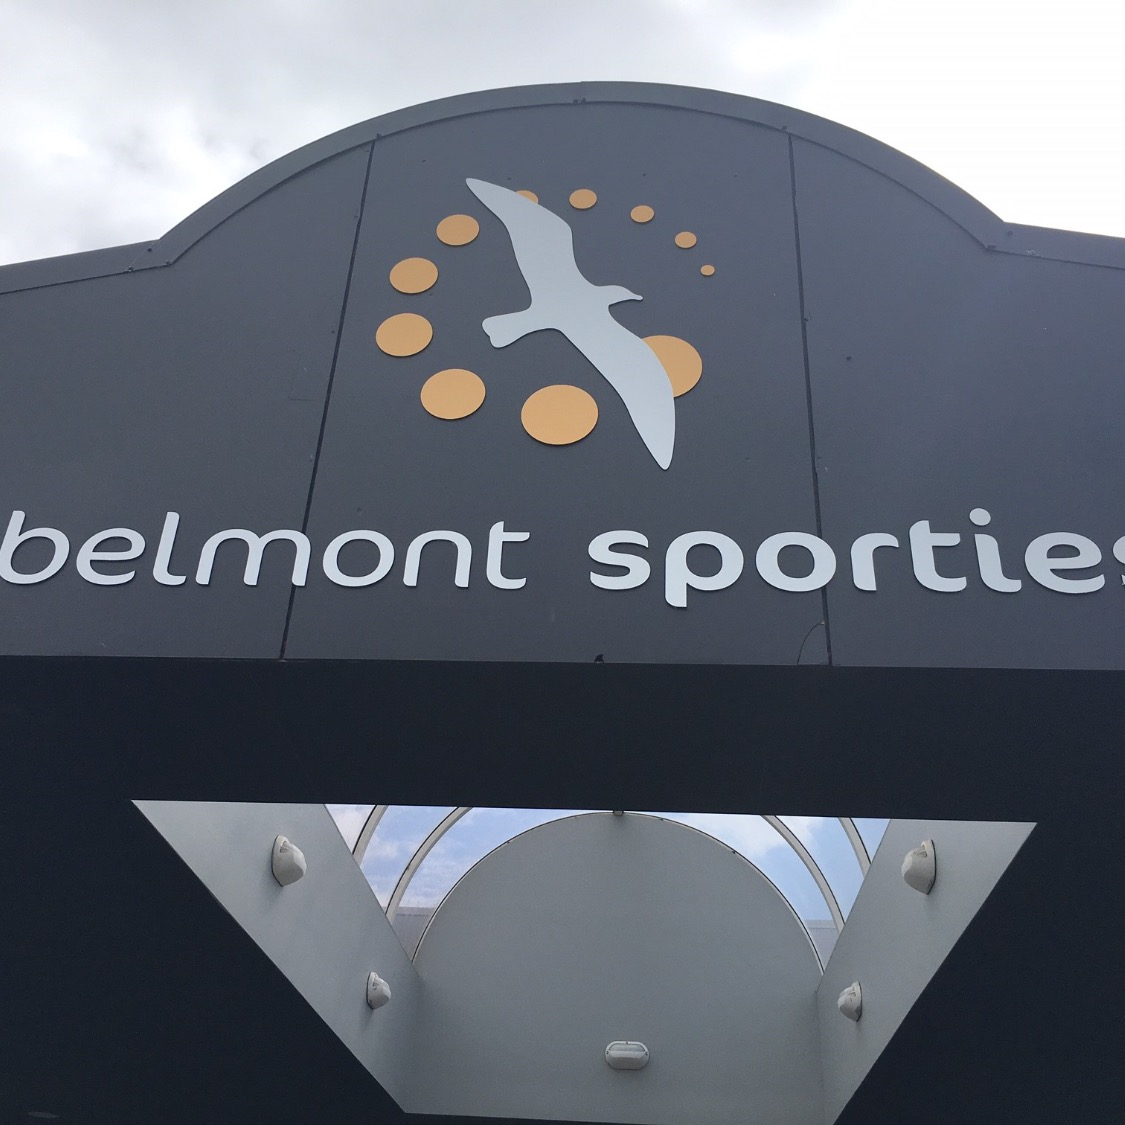 Belmont Sporties Club